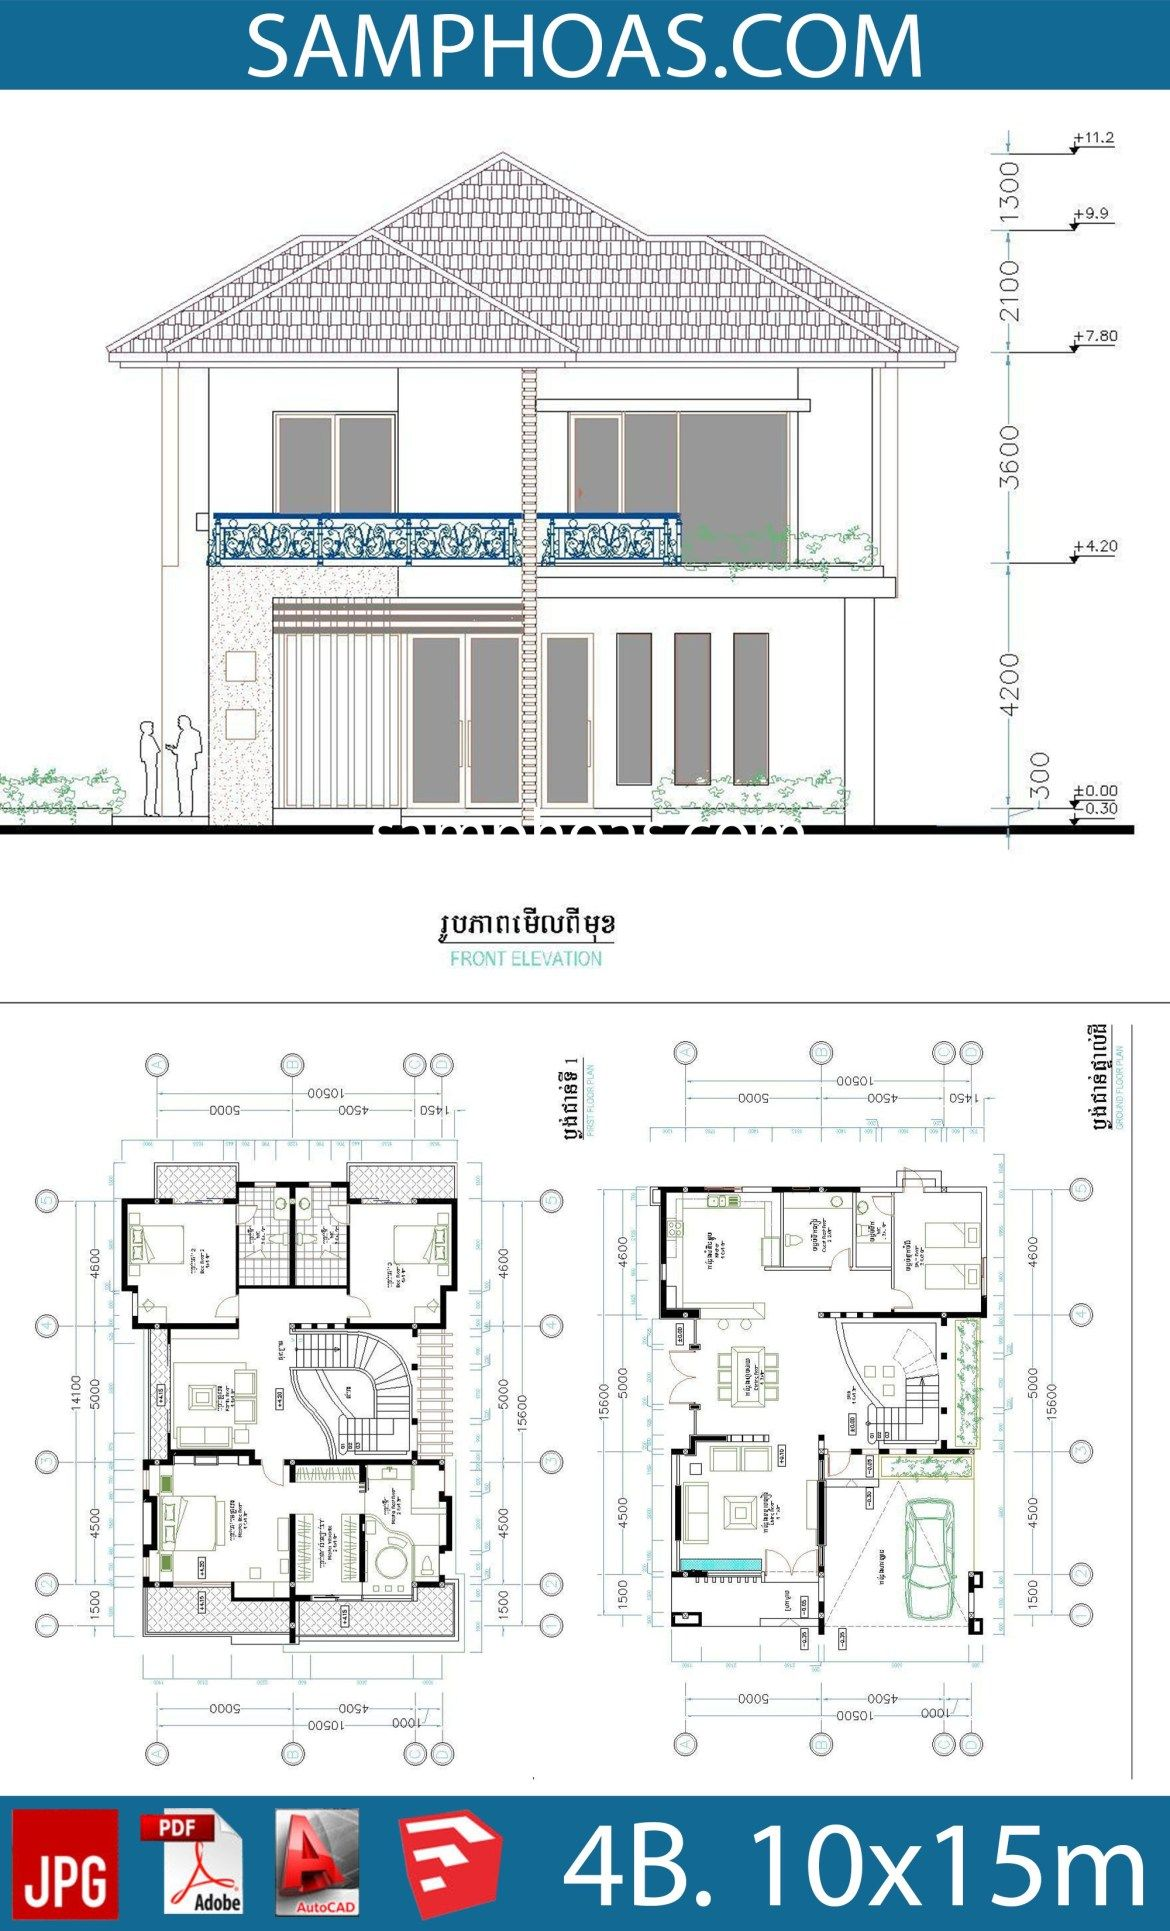 9 Bedroom Home Plan Full Exterior and Interior 9x9.9m - SamPhoas